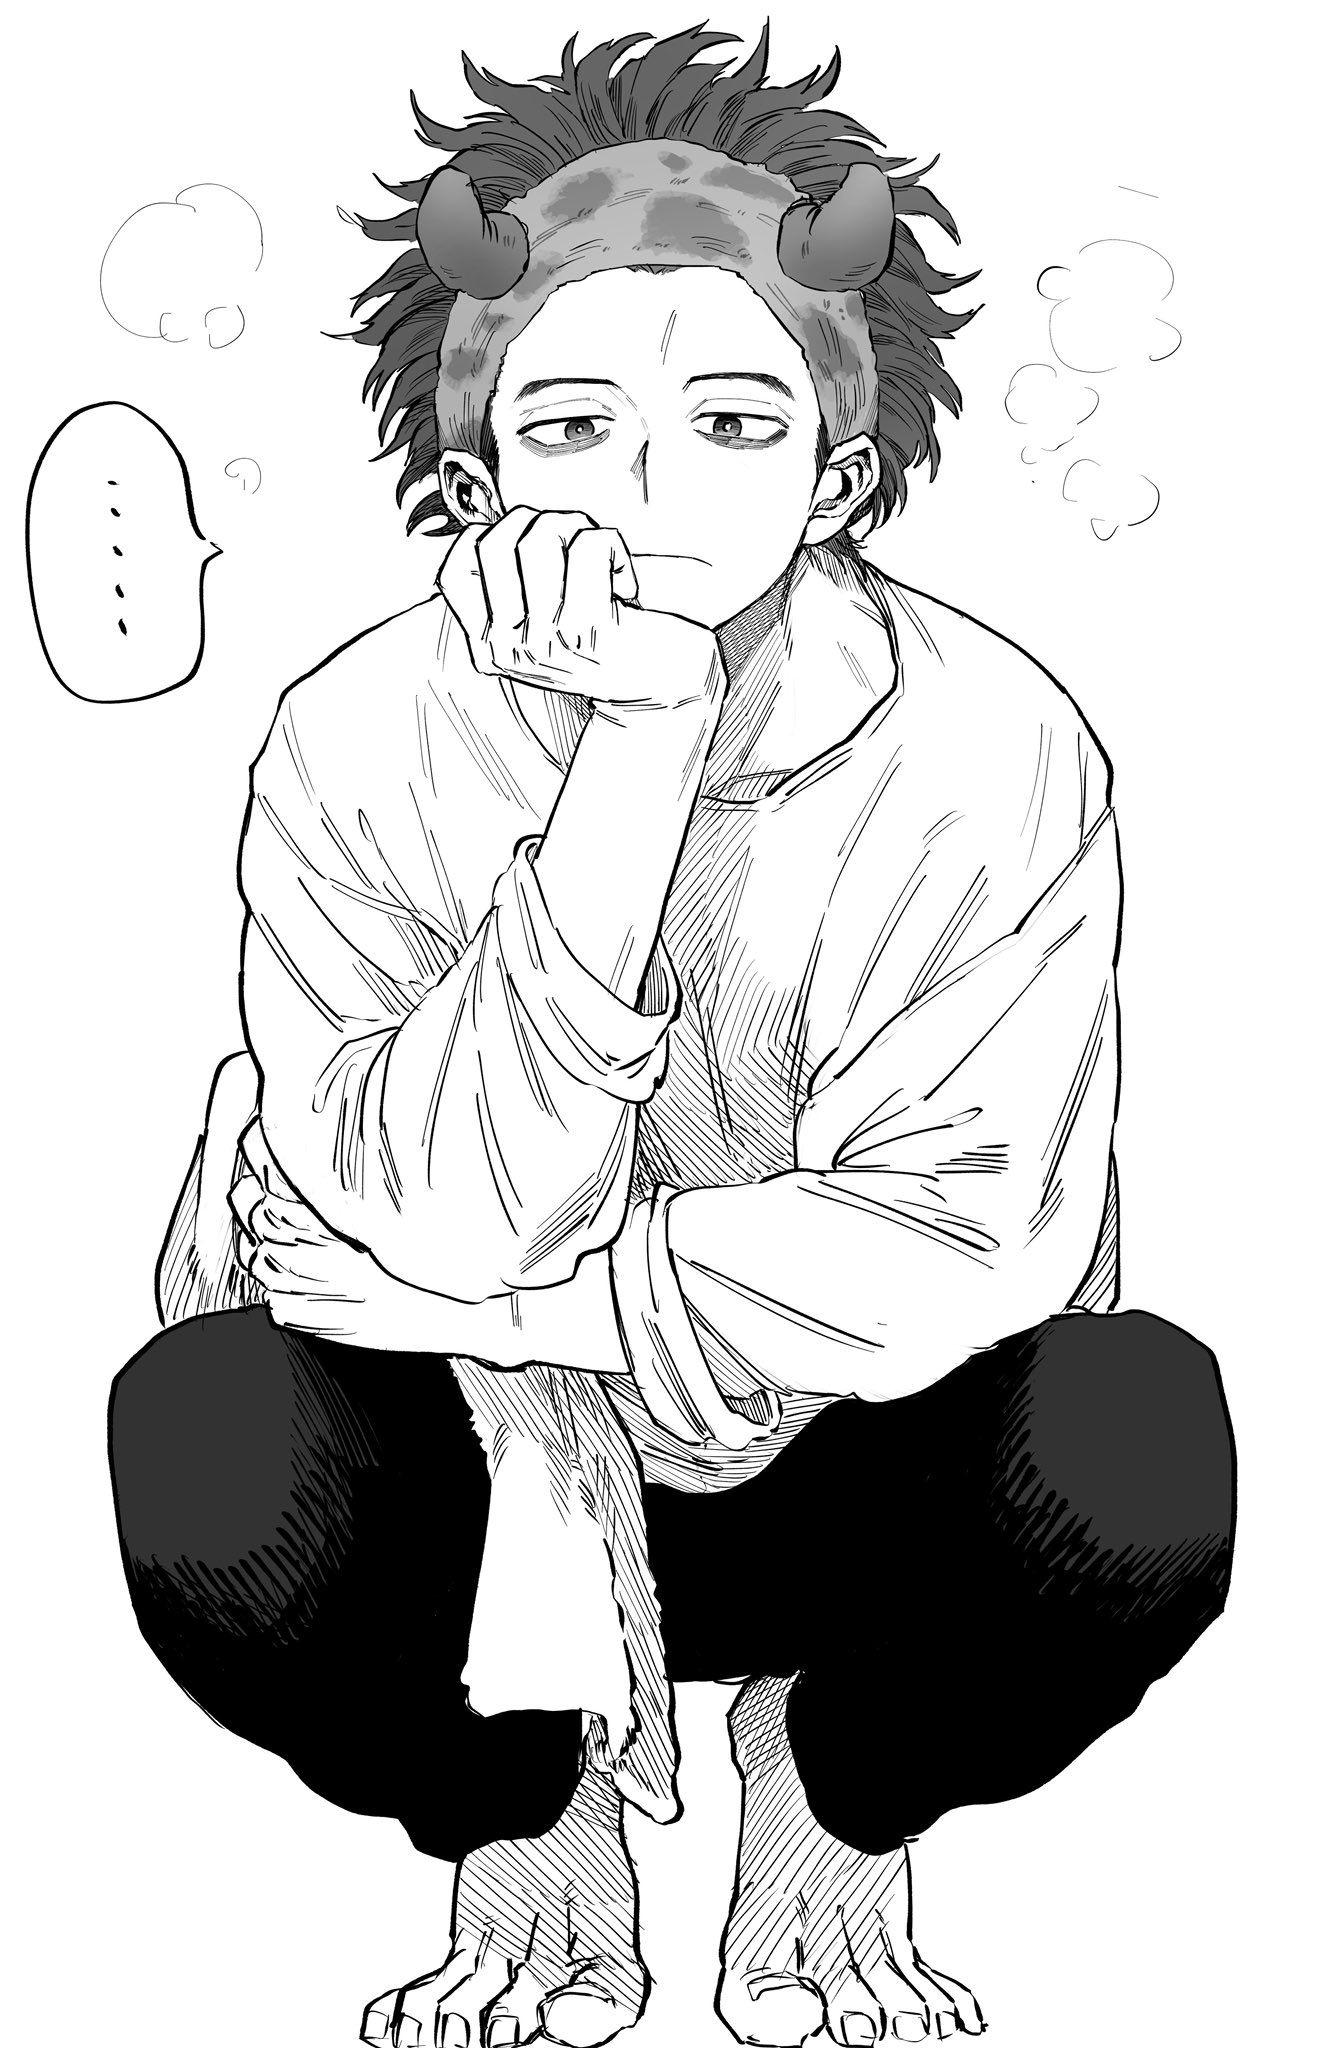 城田 on Twitter